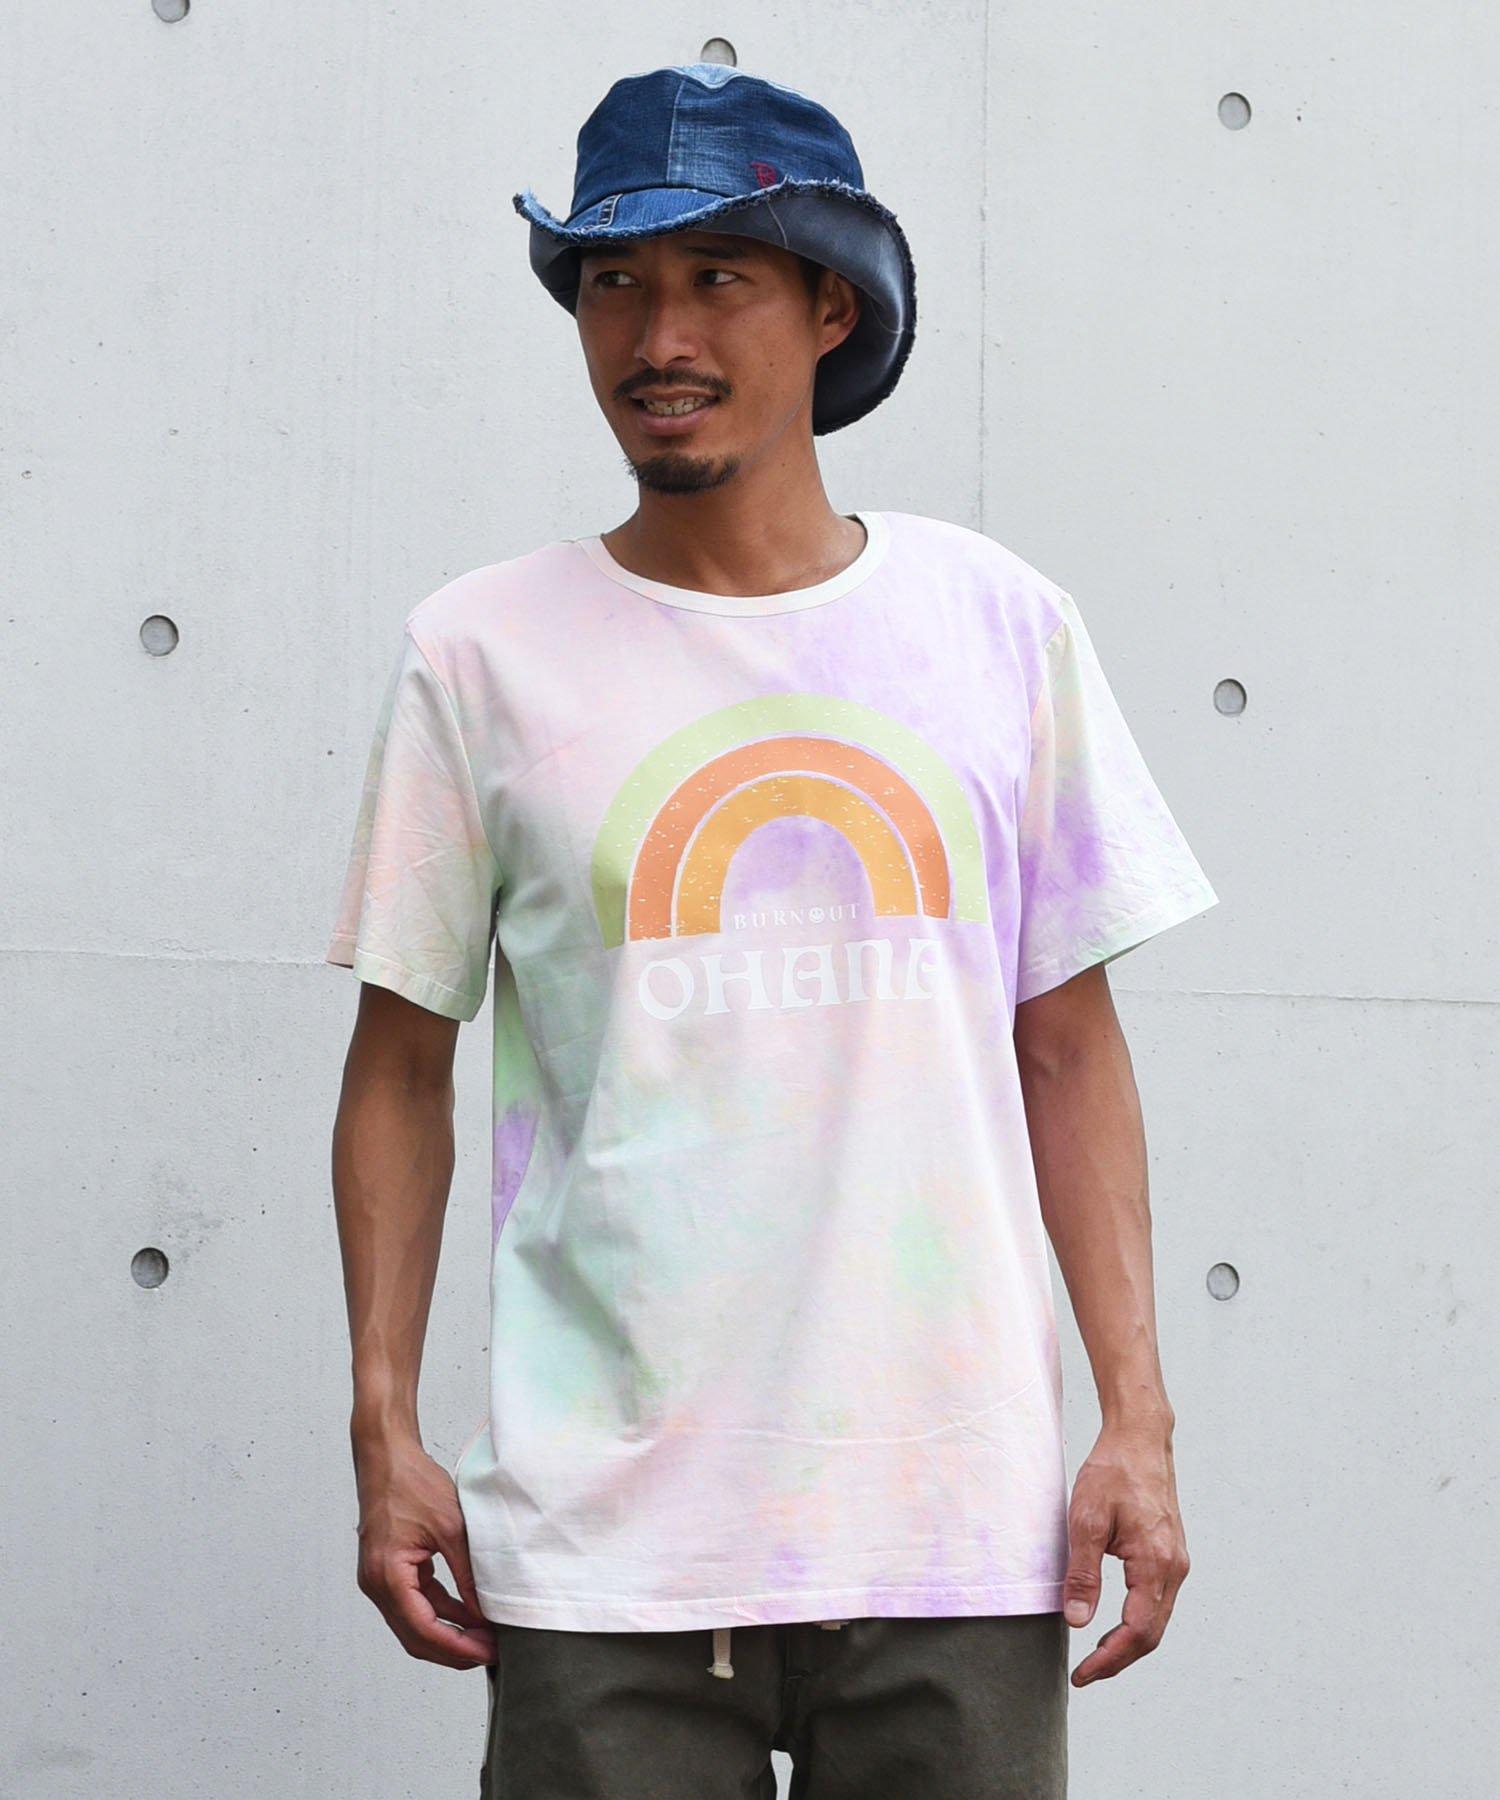 Burnout(バーンアウト )tie-dye Tee OHANA print T-shirts/ピンクパープル